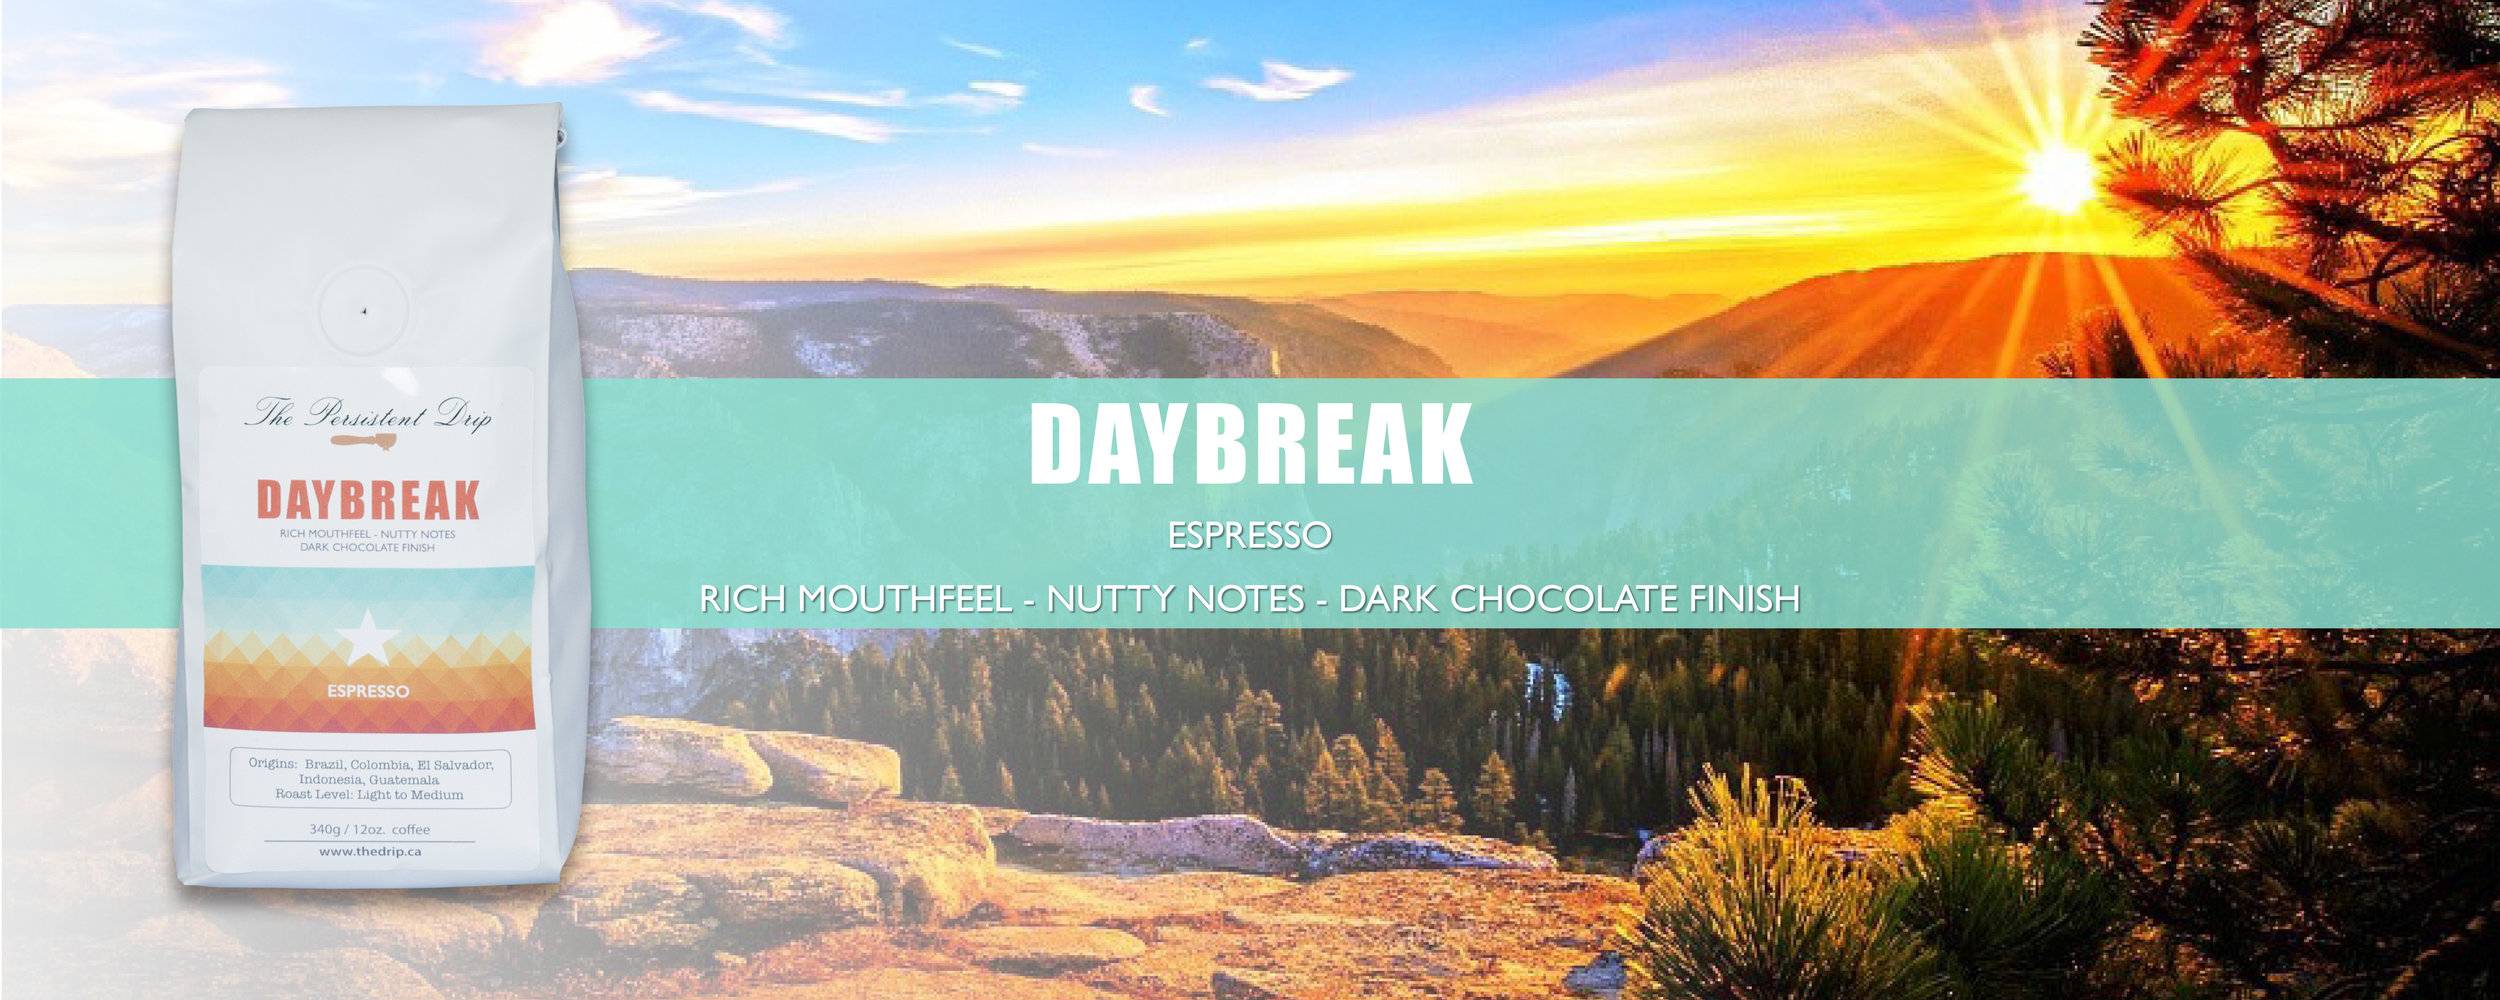 Banner-C-Daybreak.jpg